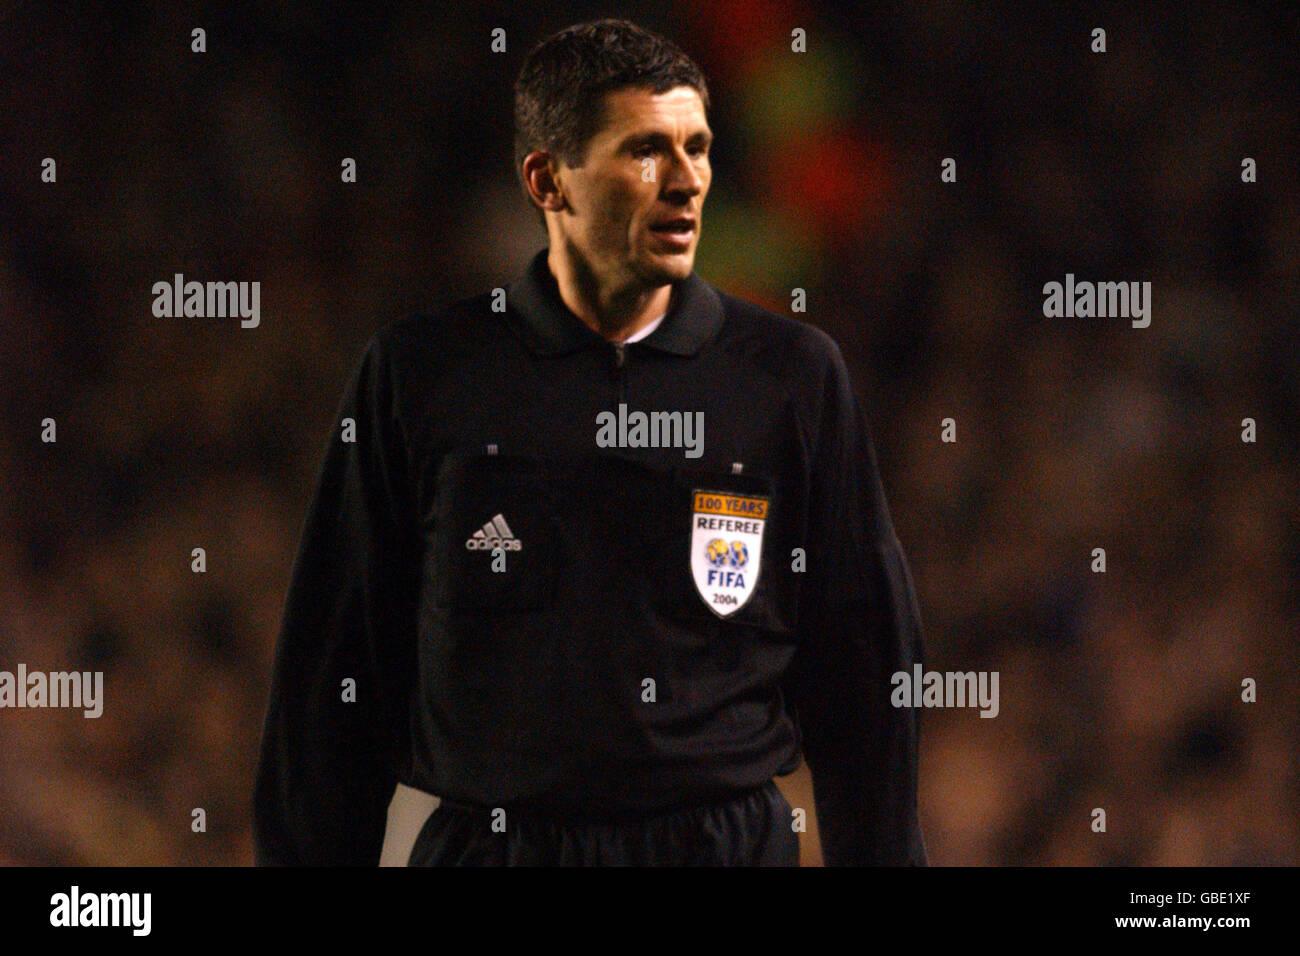 Soccer - UEFA Champions League - Quarter Final - Second Leg - Arsenal v Chelsea - Stock Image